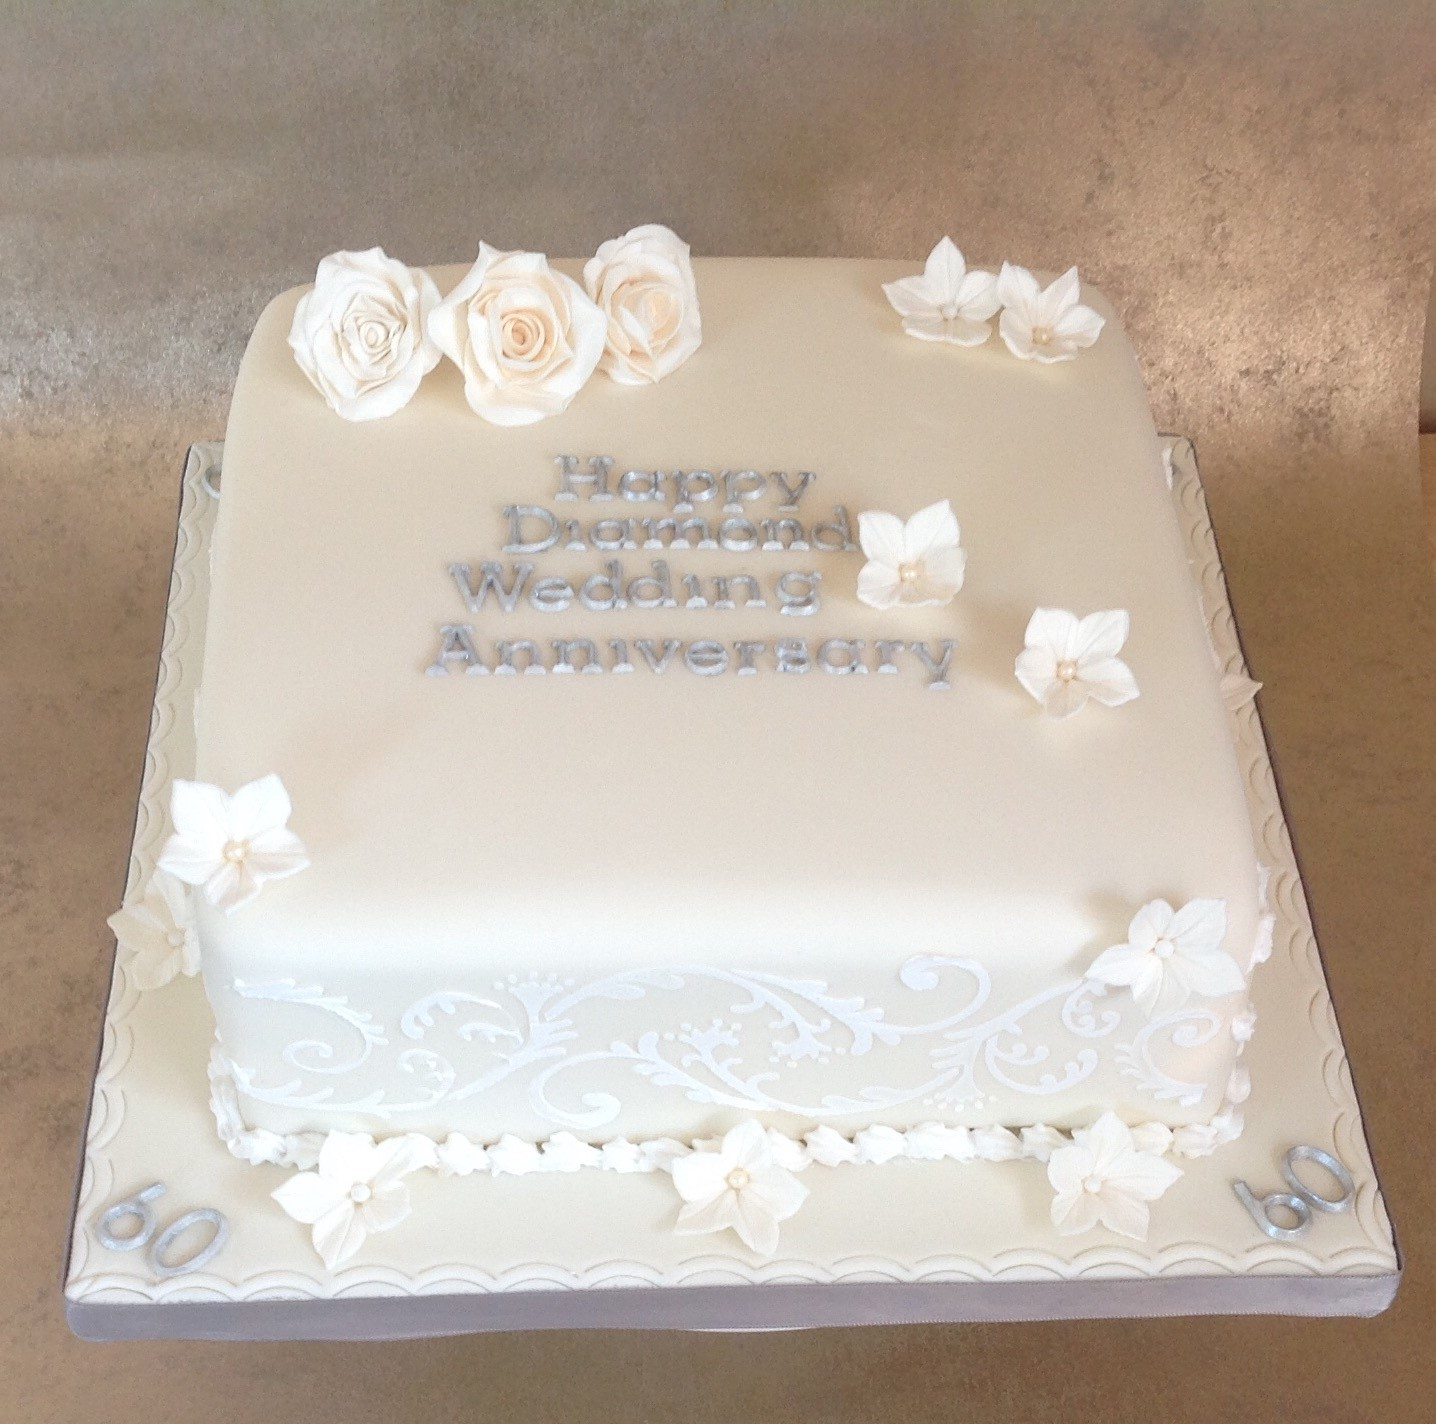 13 Diamond Anniversary Cakes Designs Idea Photo - 60th Diamond ...